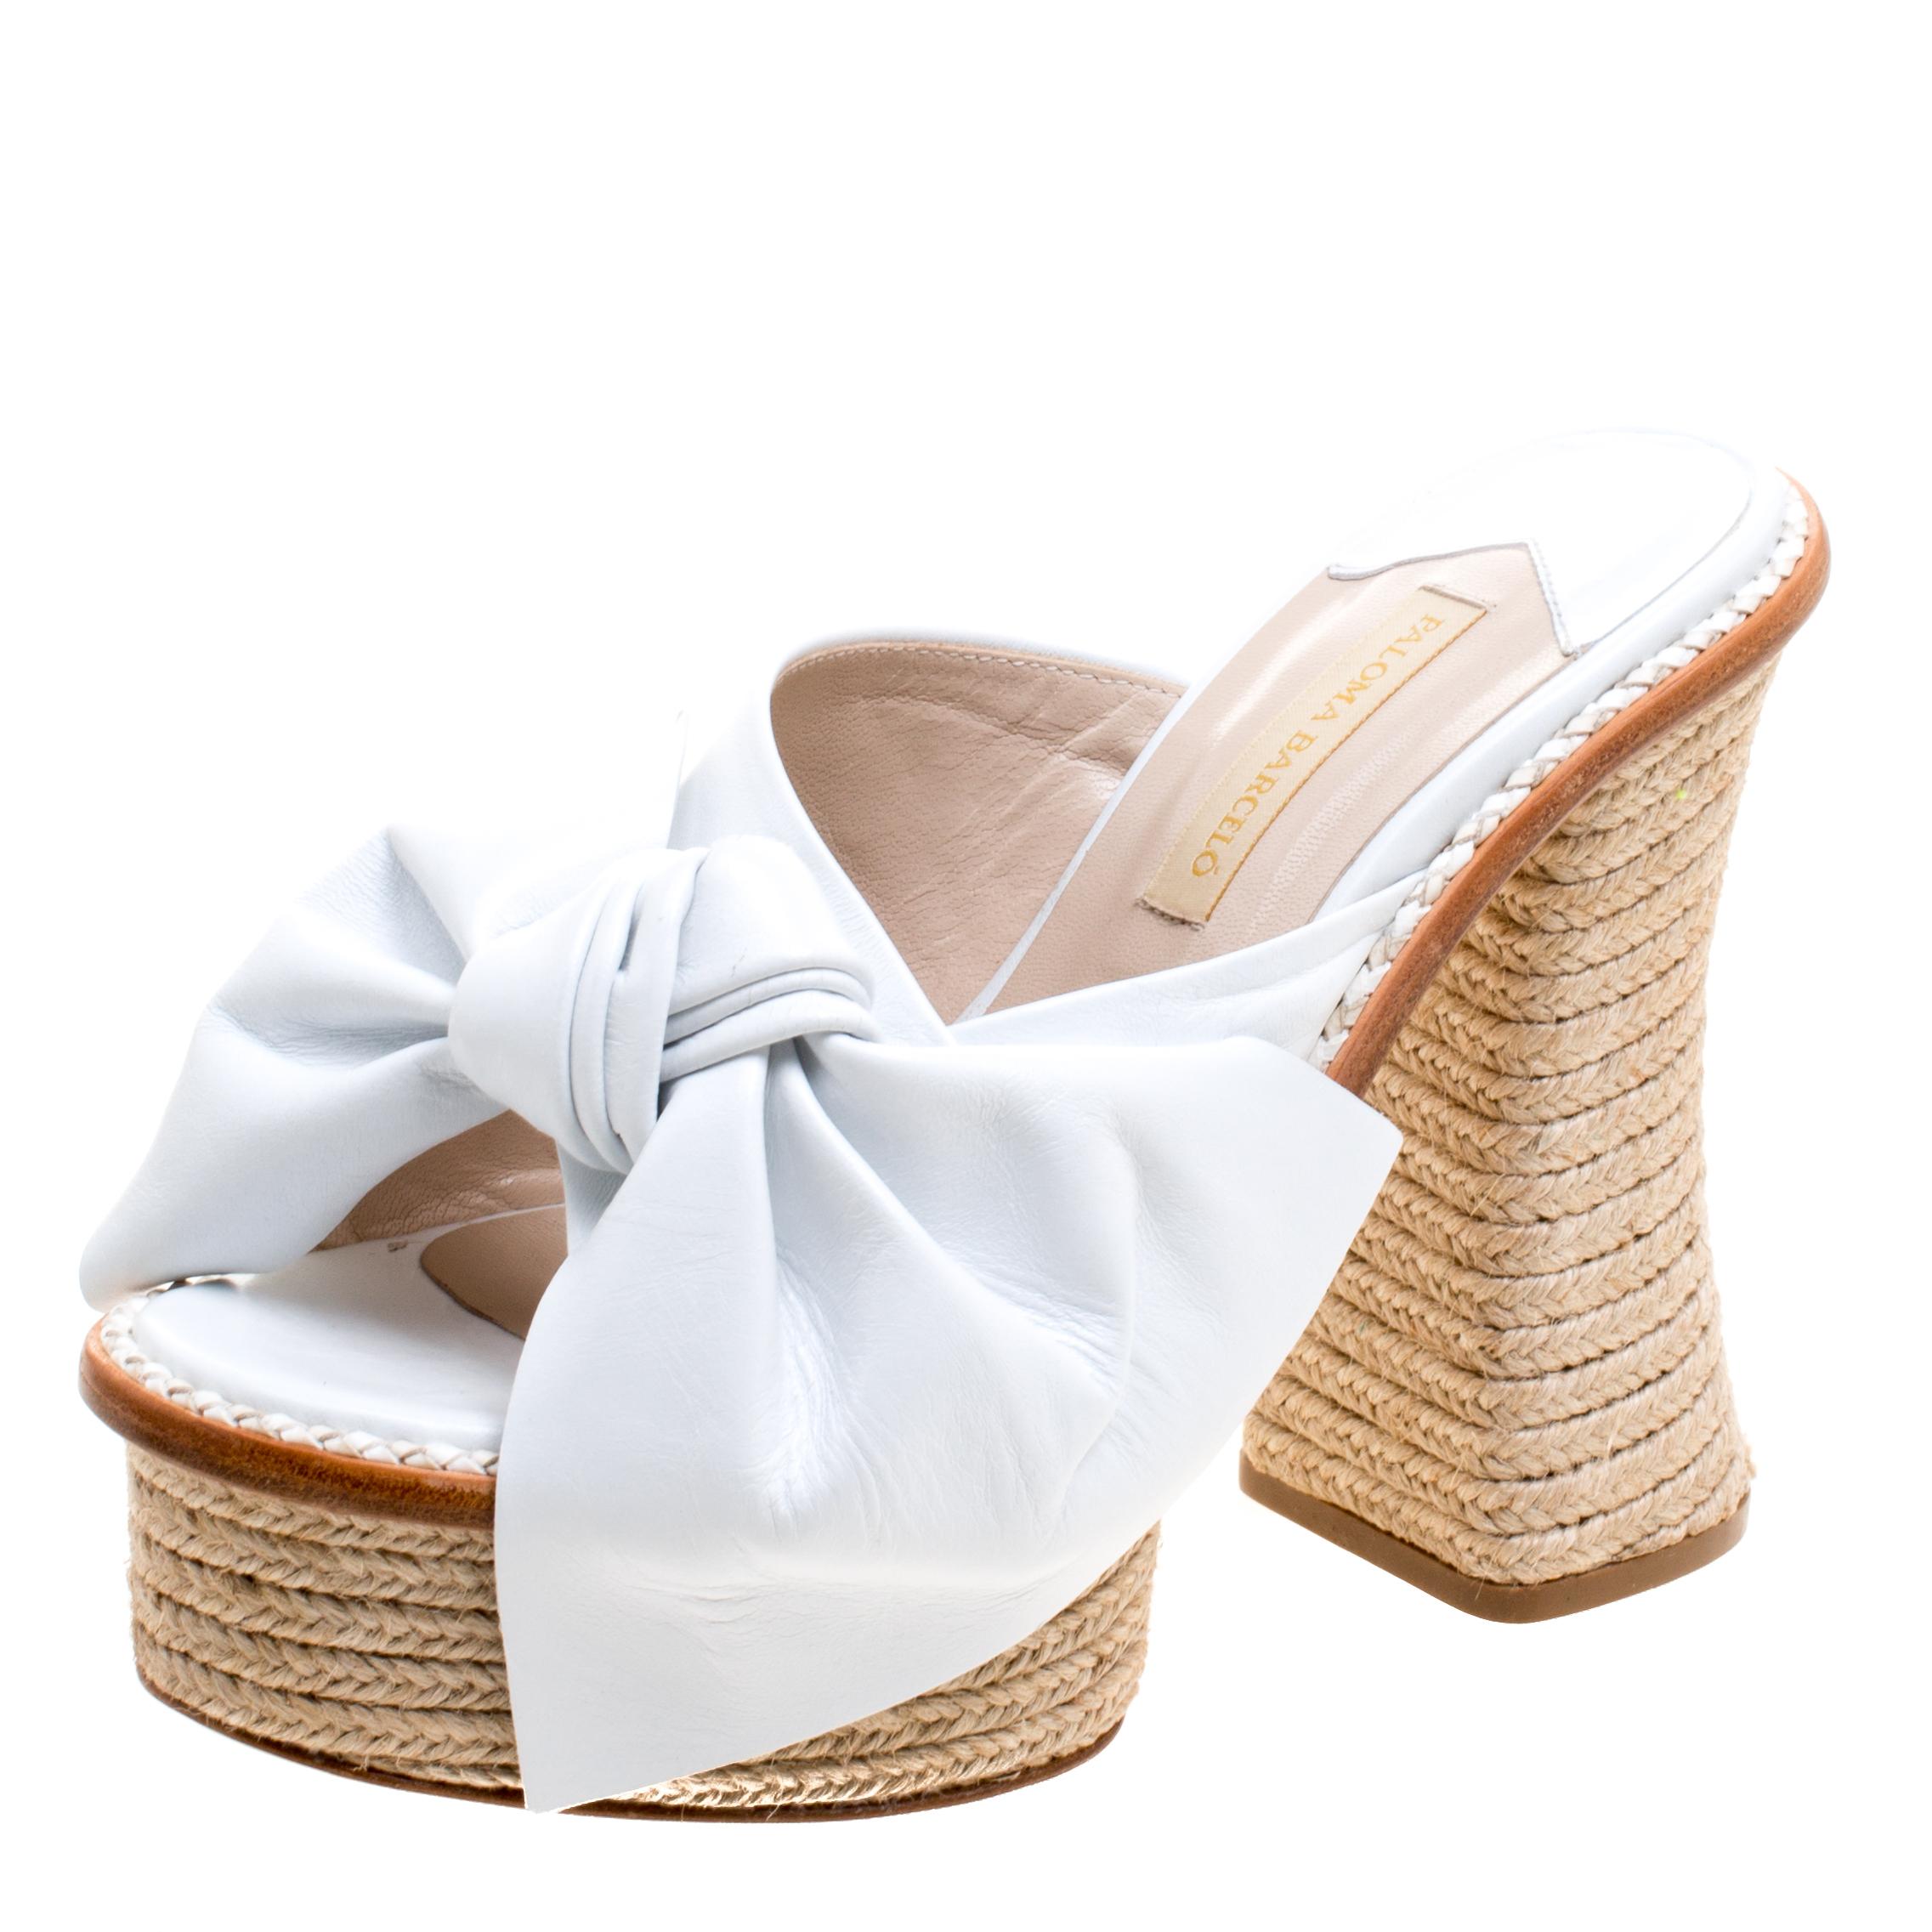 Paloma Barceló White Leather Monaco Bow Detail Espadrille Mules Size 38